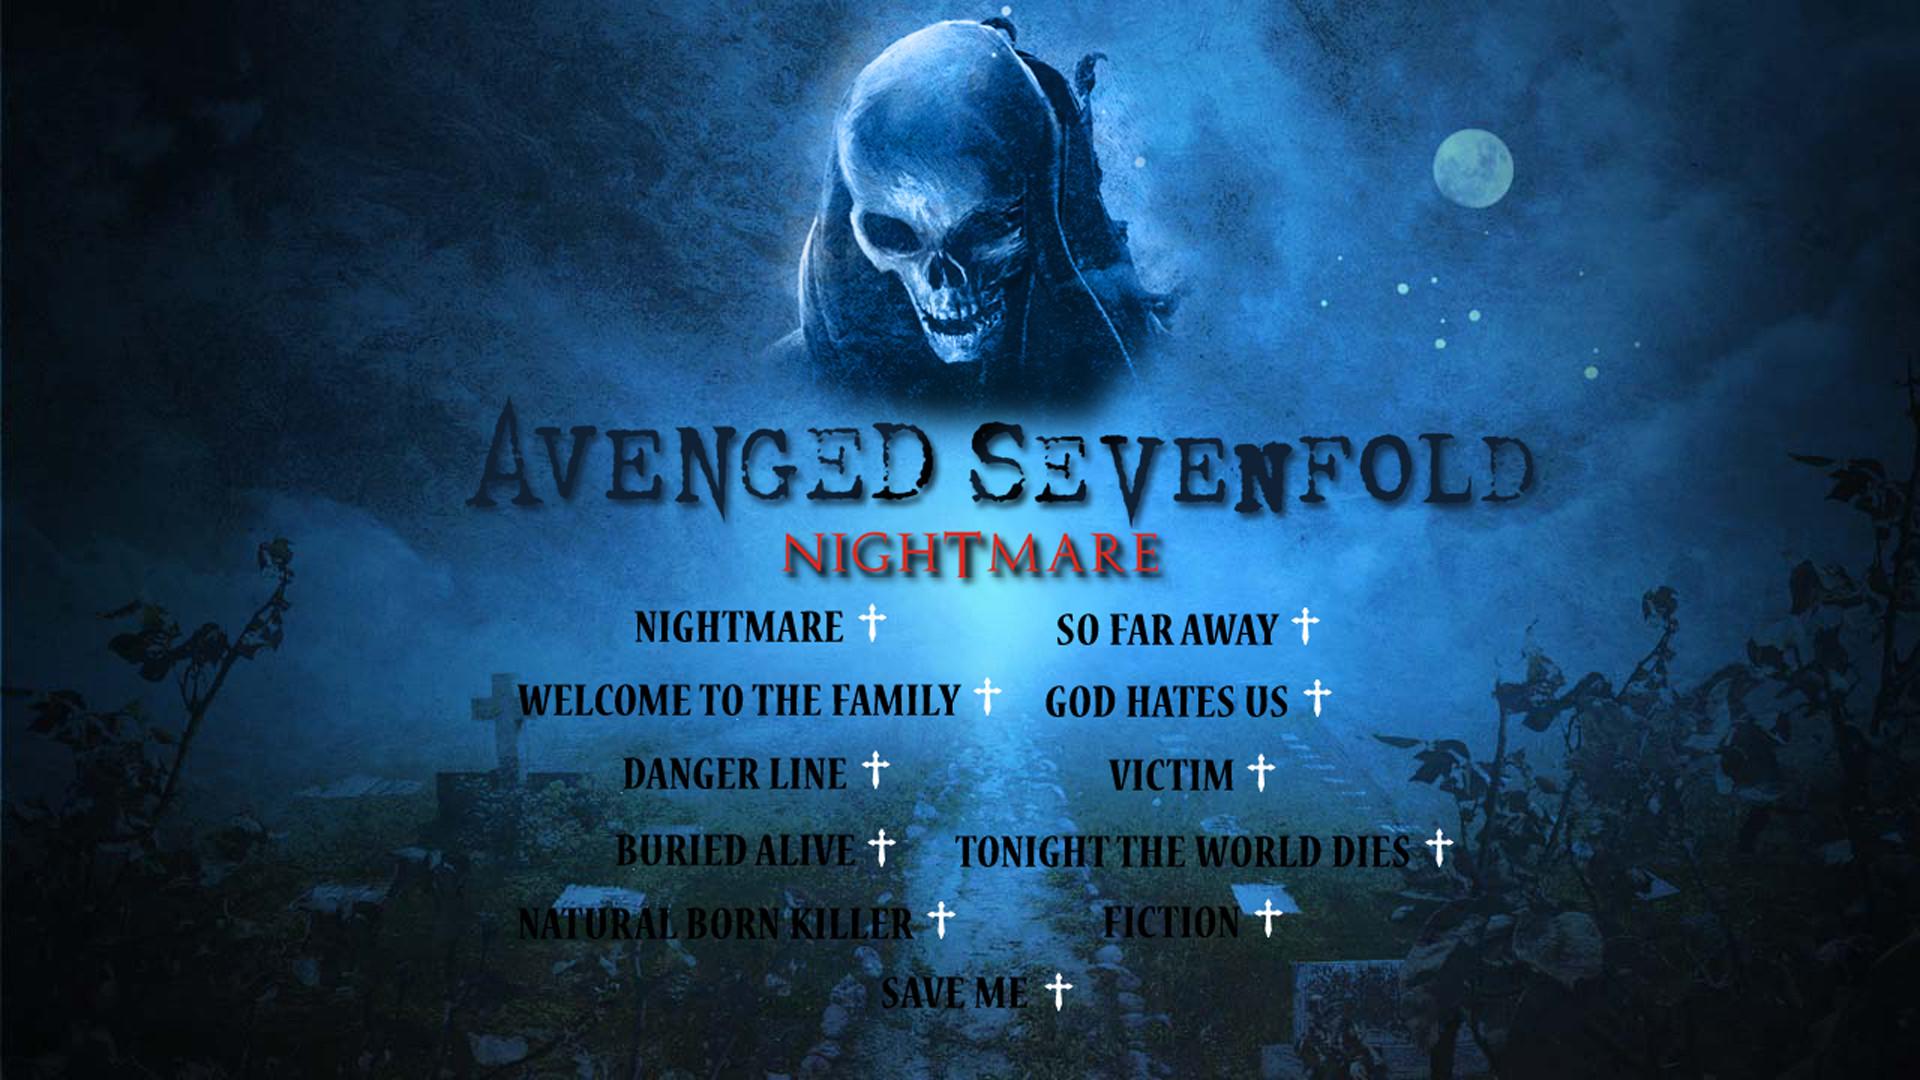 … free avenged sevenfold nightmare wallpaper full hd as wallpaper hd …